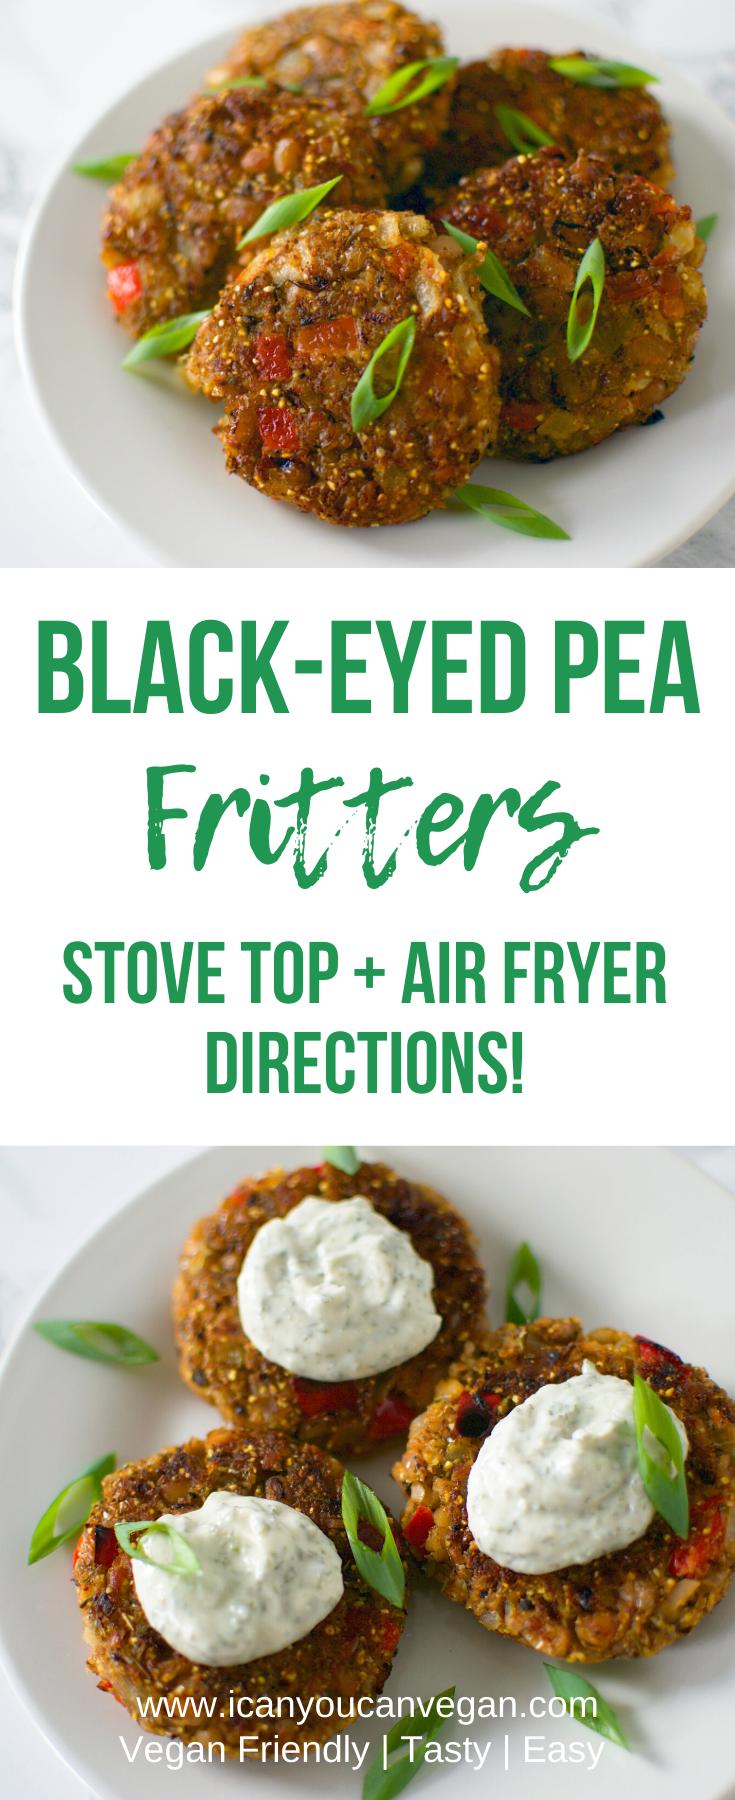 Black-Eyed Pea Fritters | ICanYouCanVegan Black-Eyed Pea Fritters #blackeyedpeasrecipe Black-Eyed Pea Fritters | ICanYouCanVegan Black-Eyed Pea Fritters #blackeyedpeasrecipe